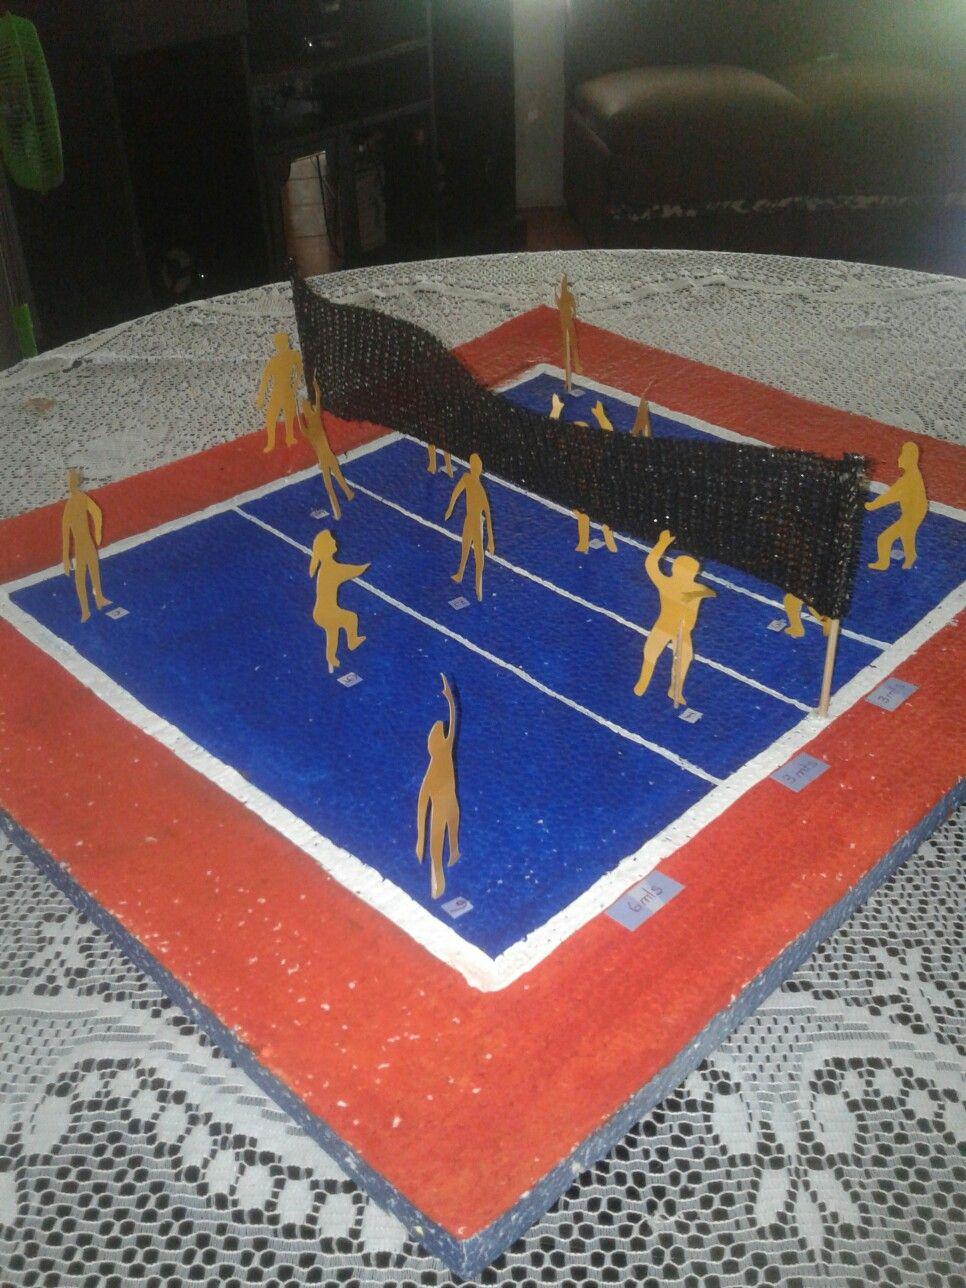 Maqueta Cancha Voleibol Biblioteca Cancha De Voleibol Maqueta